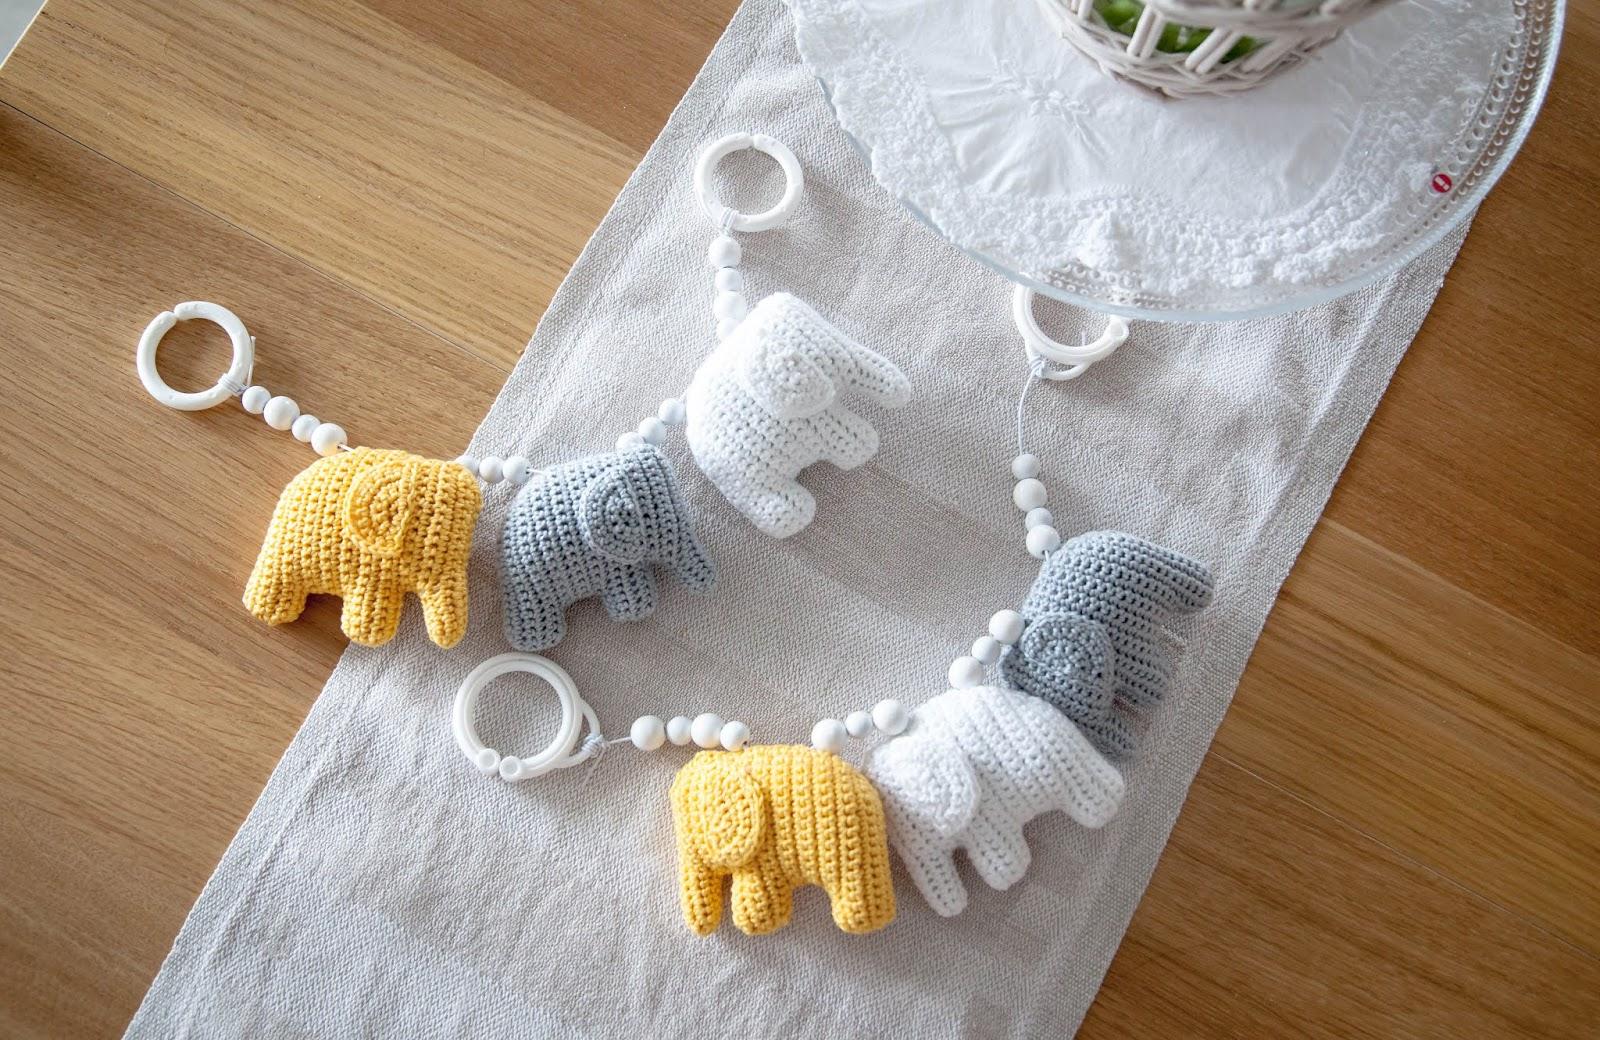 virkattu vaunulelu norsu crochet baby toy